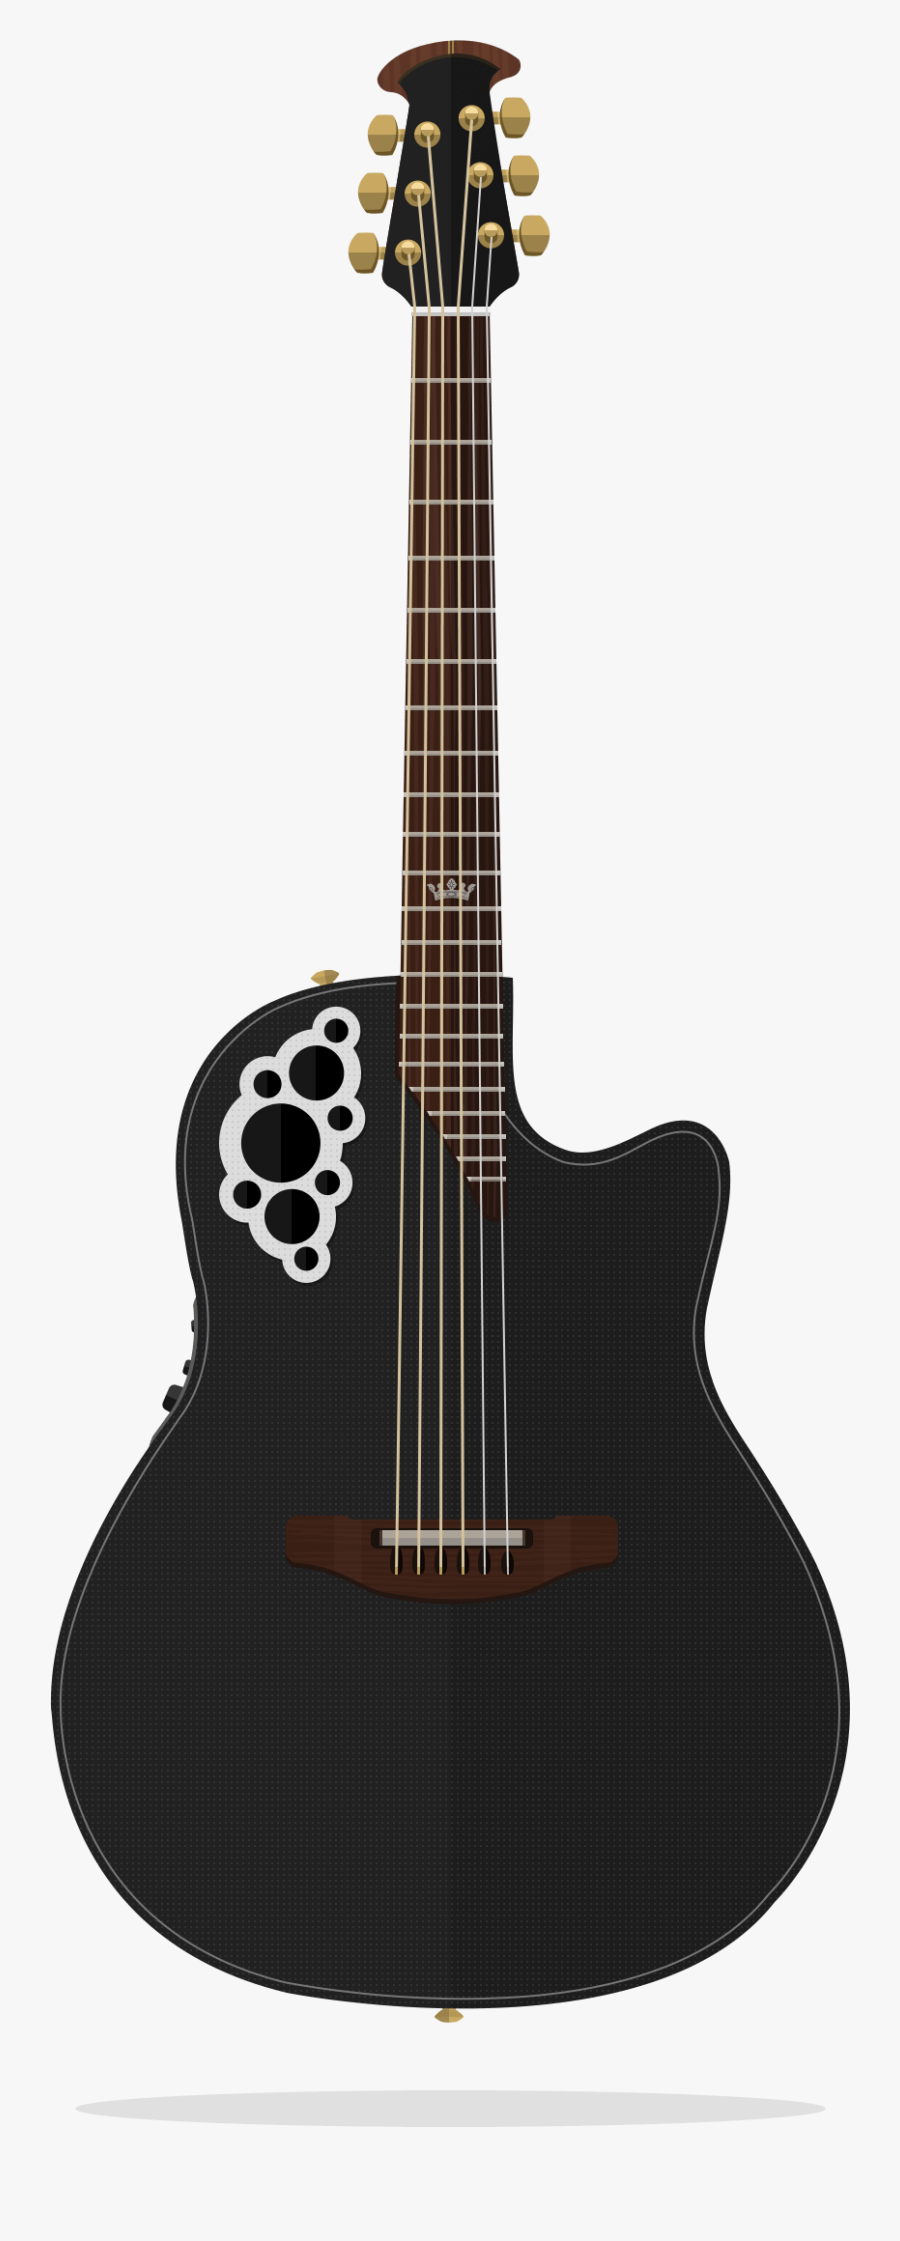 Flatguitars Clip Freeuse - Ovation Guitar Company, Transparent Clipart